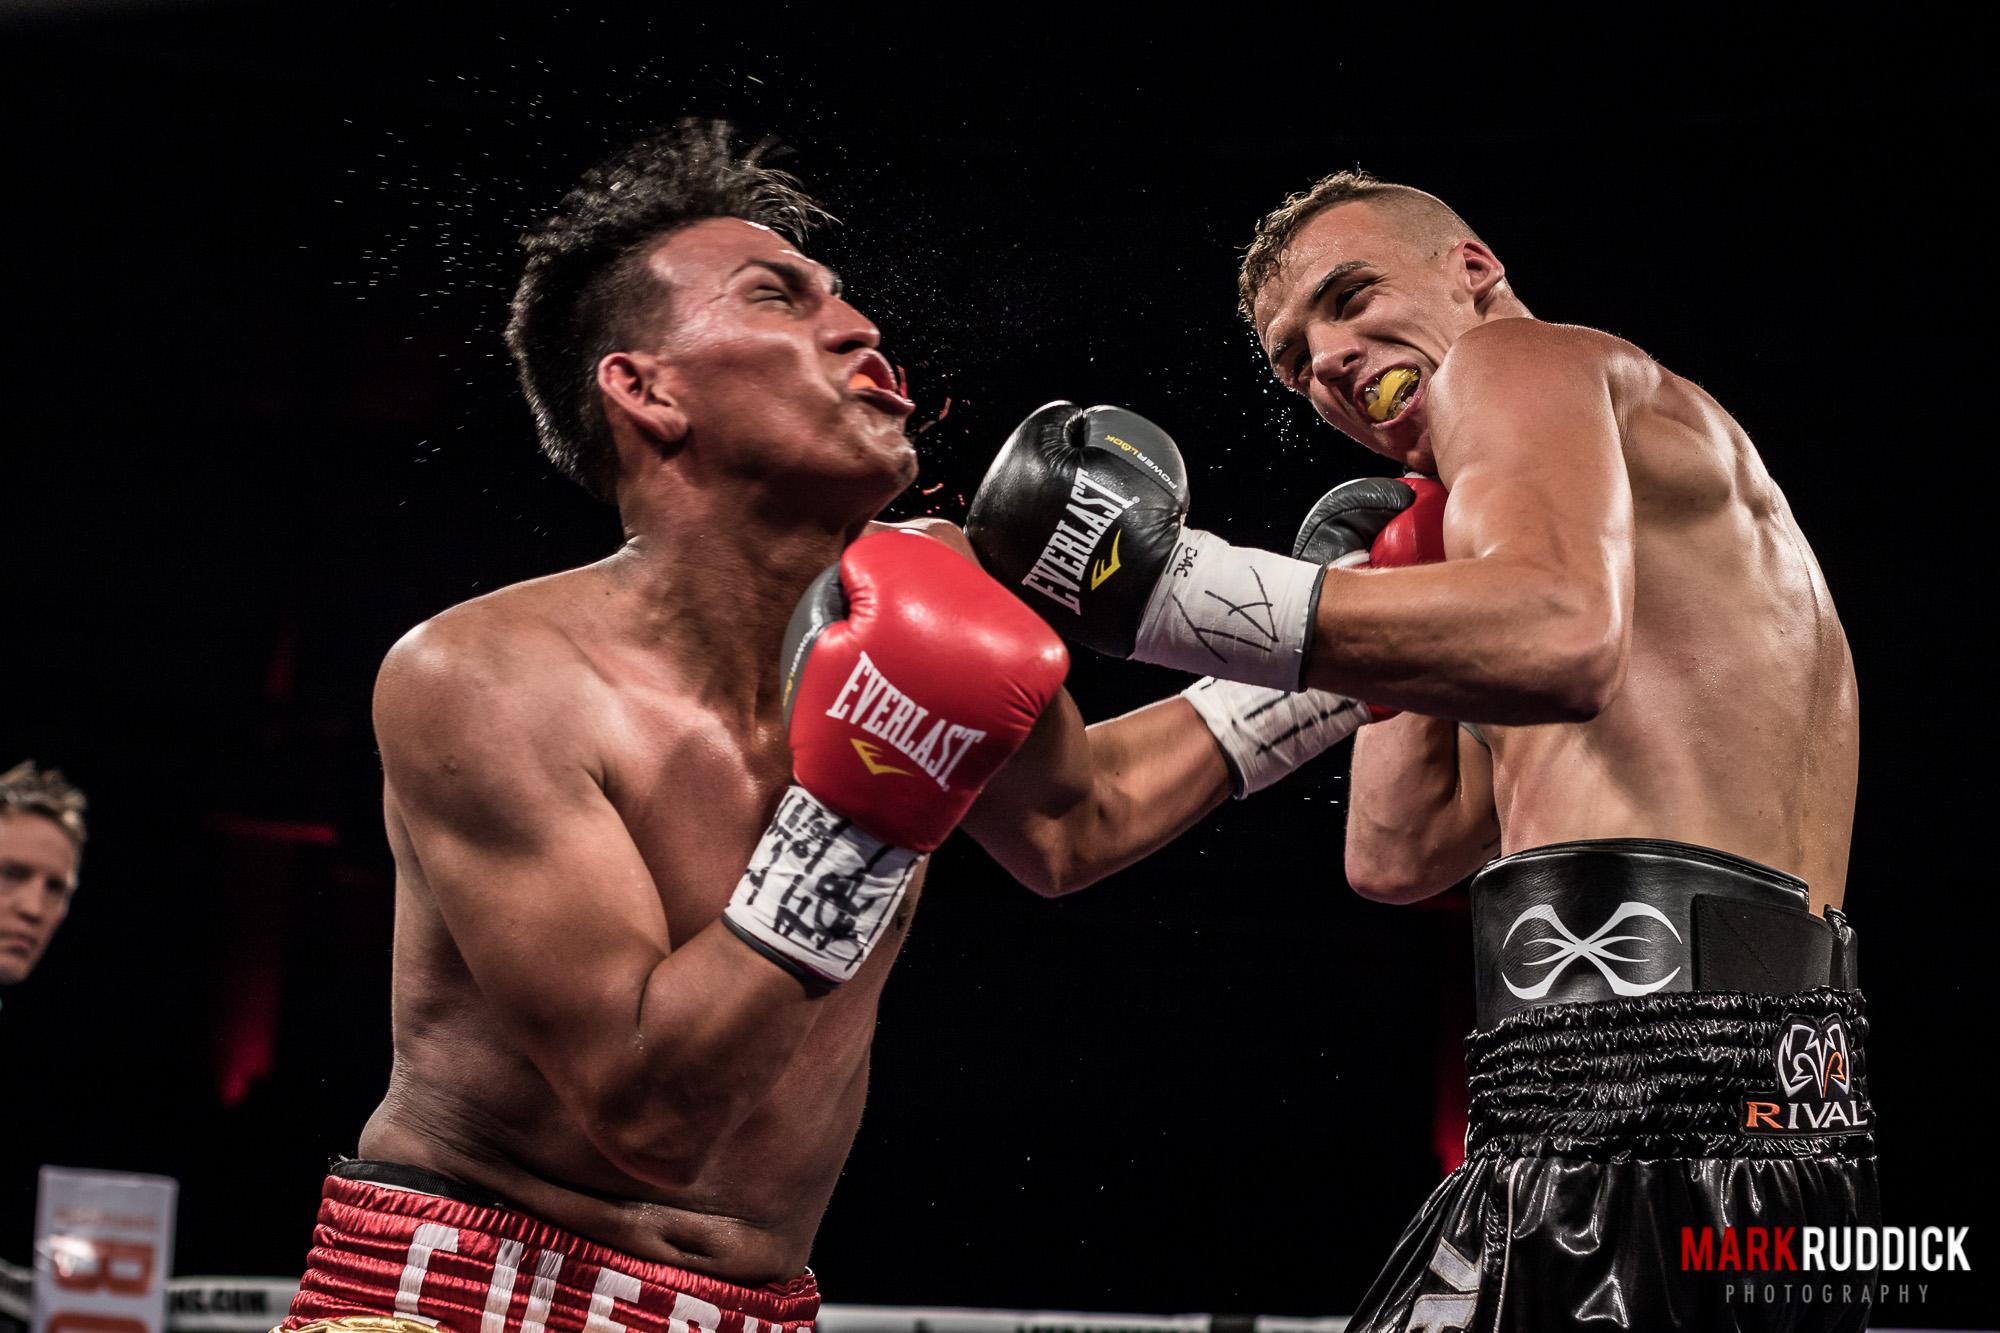 Bout #3 - Jessie Wilcox vs. Juan Carlos Chavira